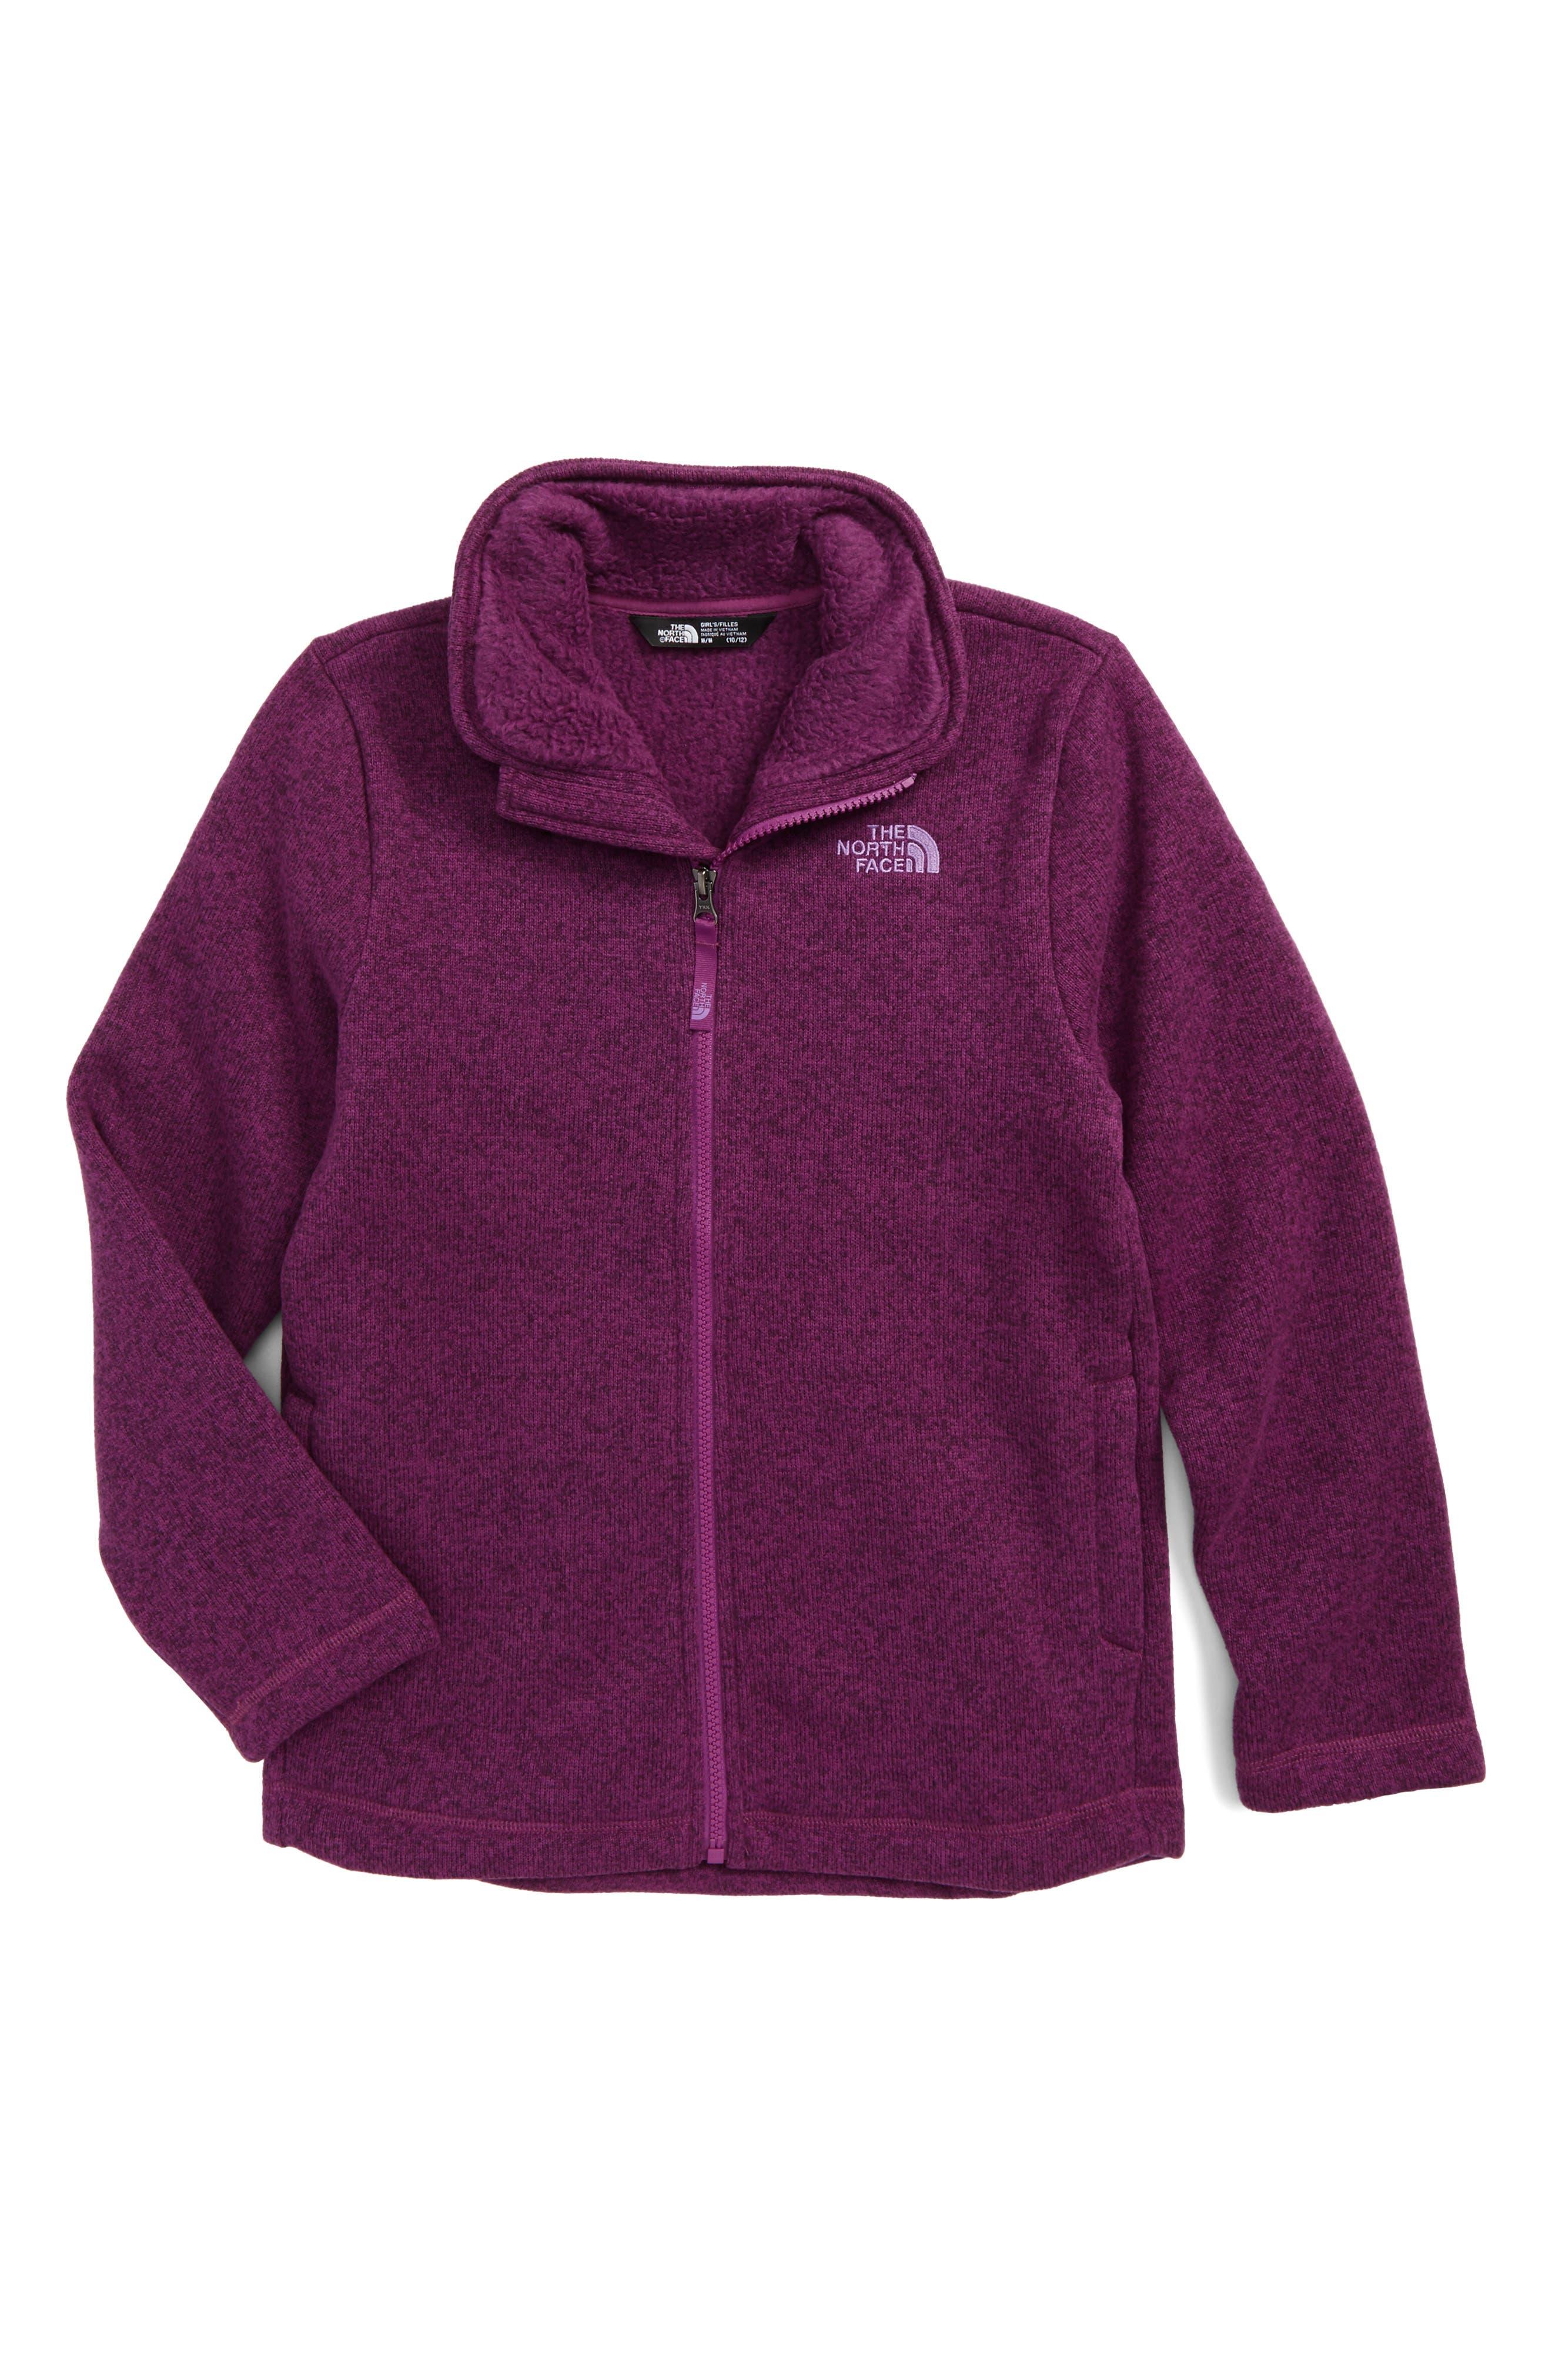 Alternate Image 1 Selected - The North Face Crescent Fleece Jacket (Little Girls & Big Girls)